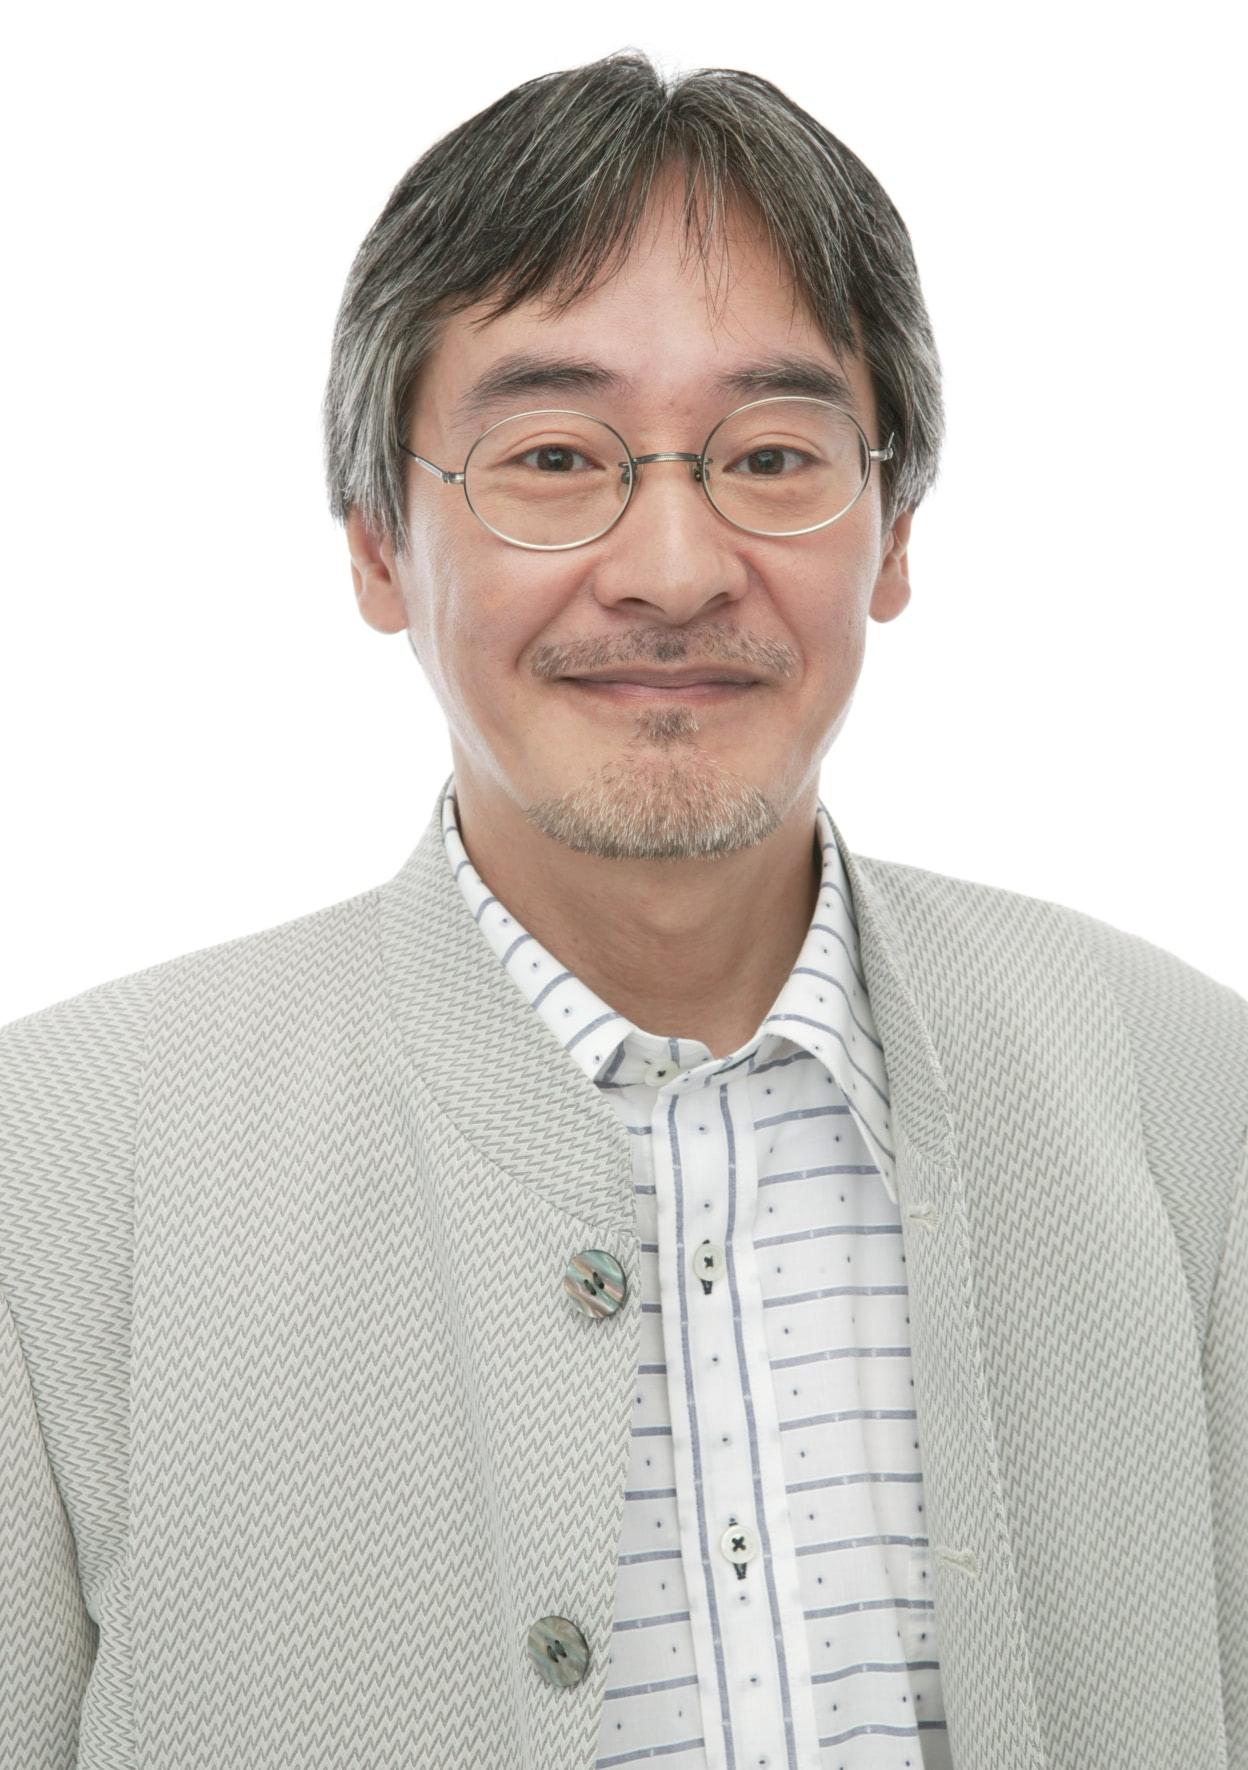 麻生智久さん(澤村松吾郎役)